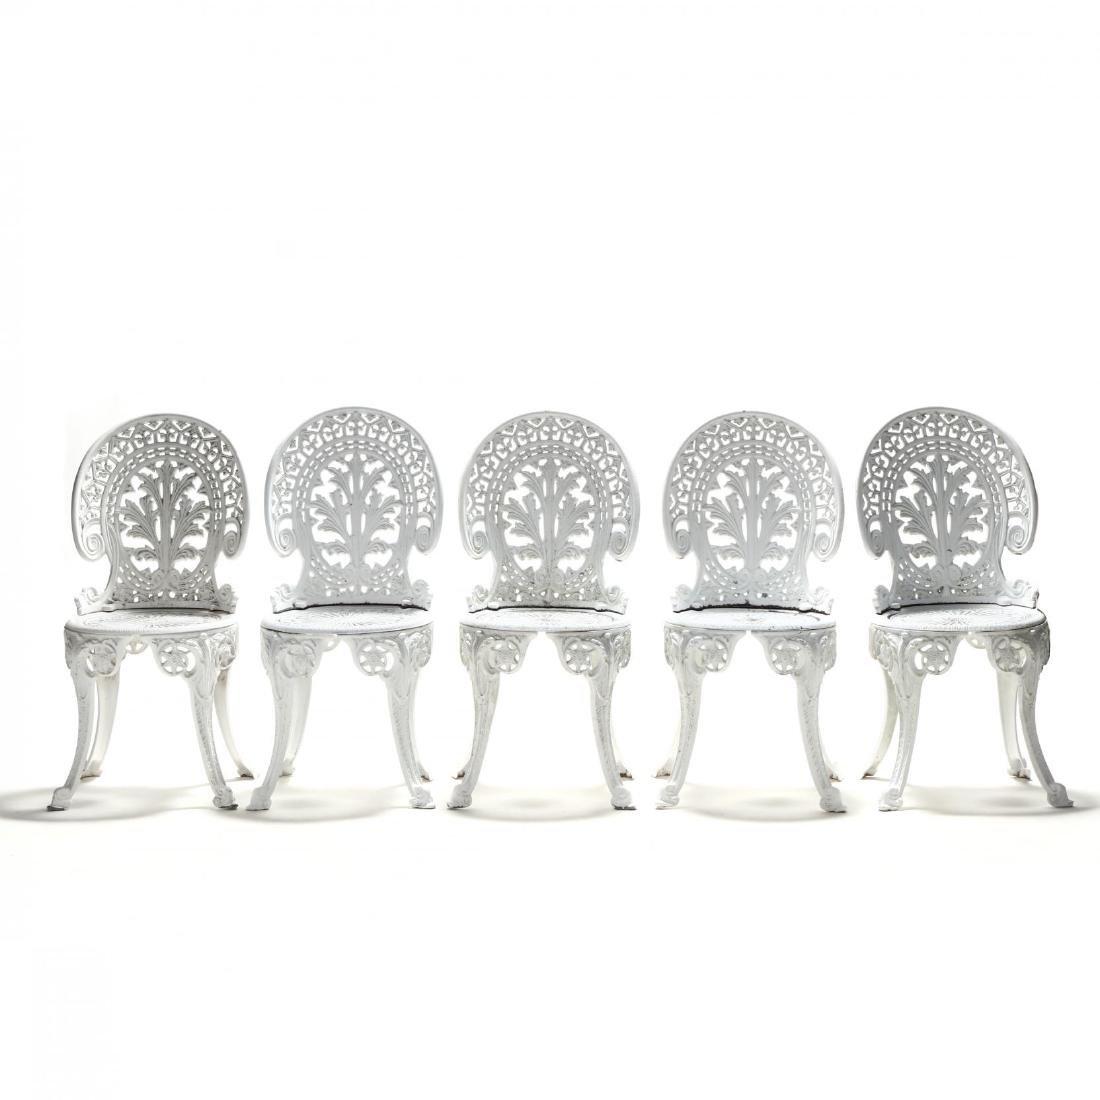 Twelve Piece Classical Style Cast Aluminum Garden Set - 2